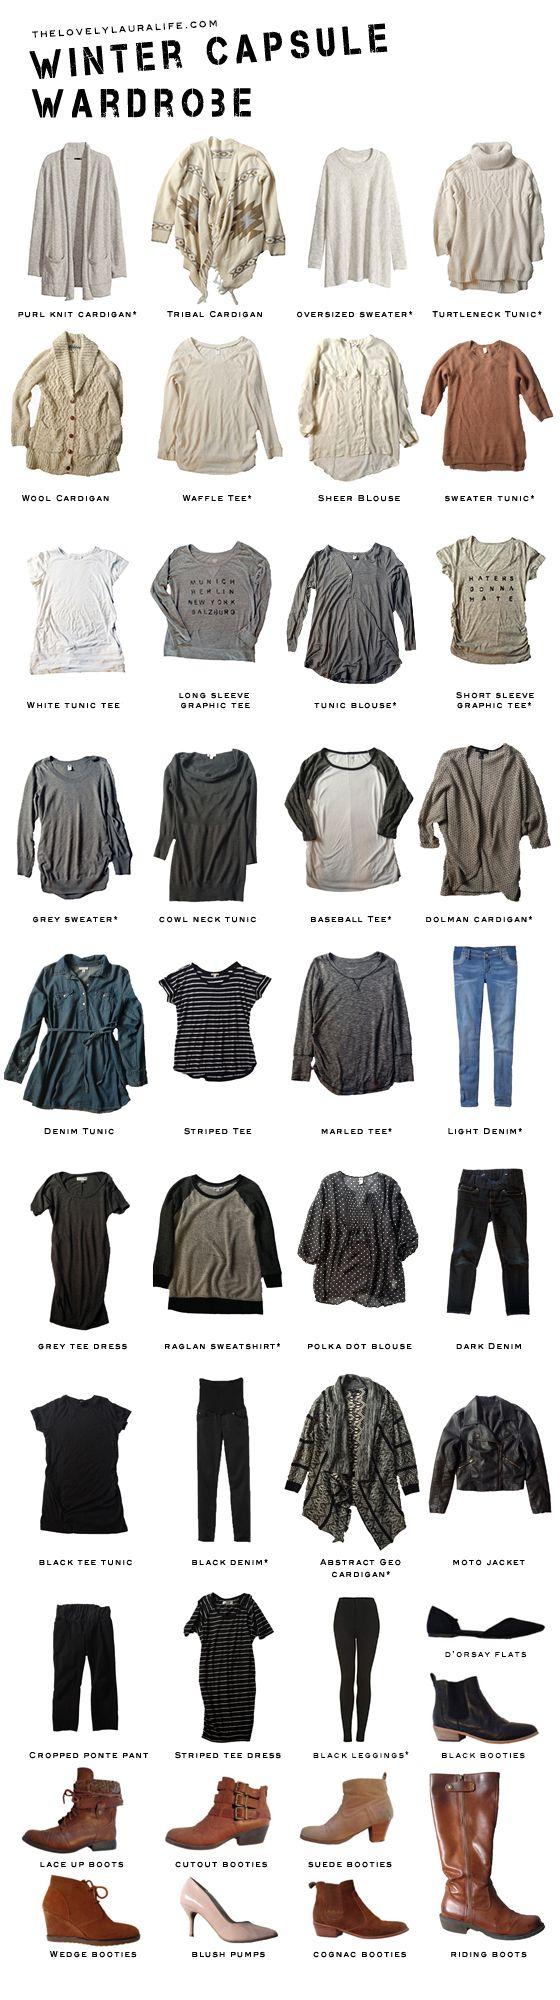 my winter [maternity] capsule wardrobe